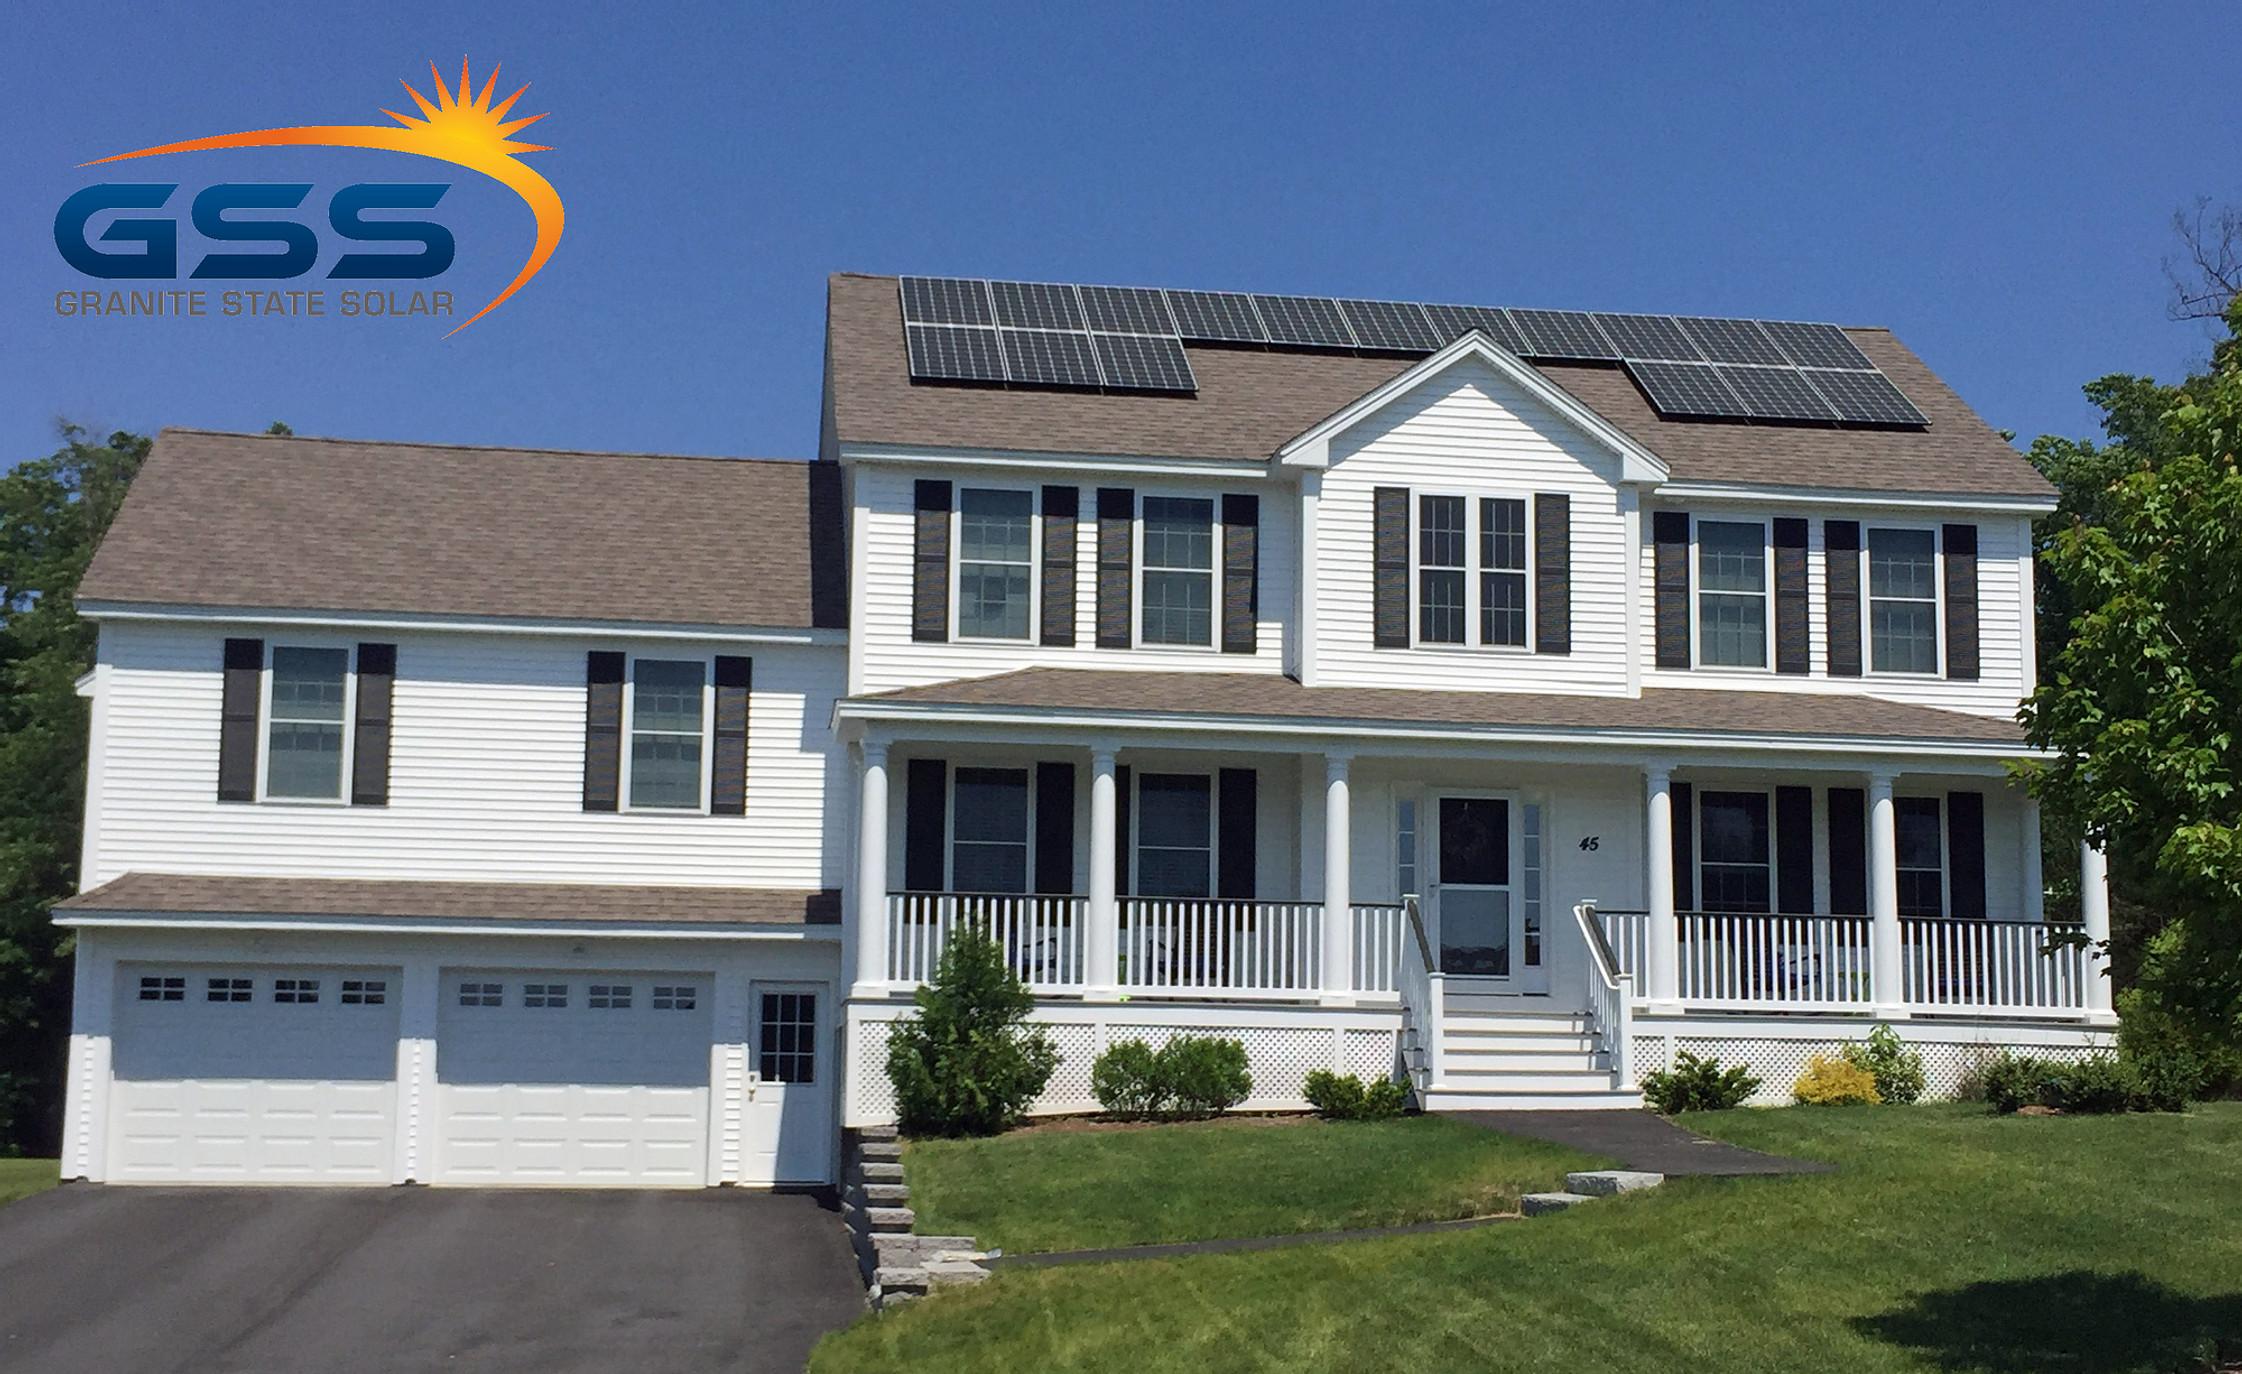 17 solar panel roof array